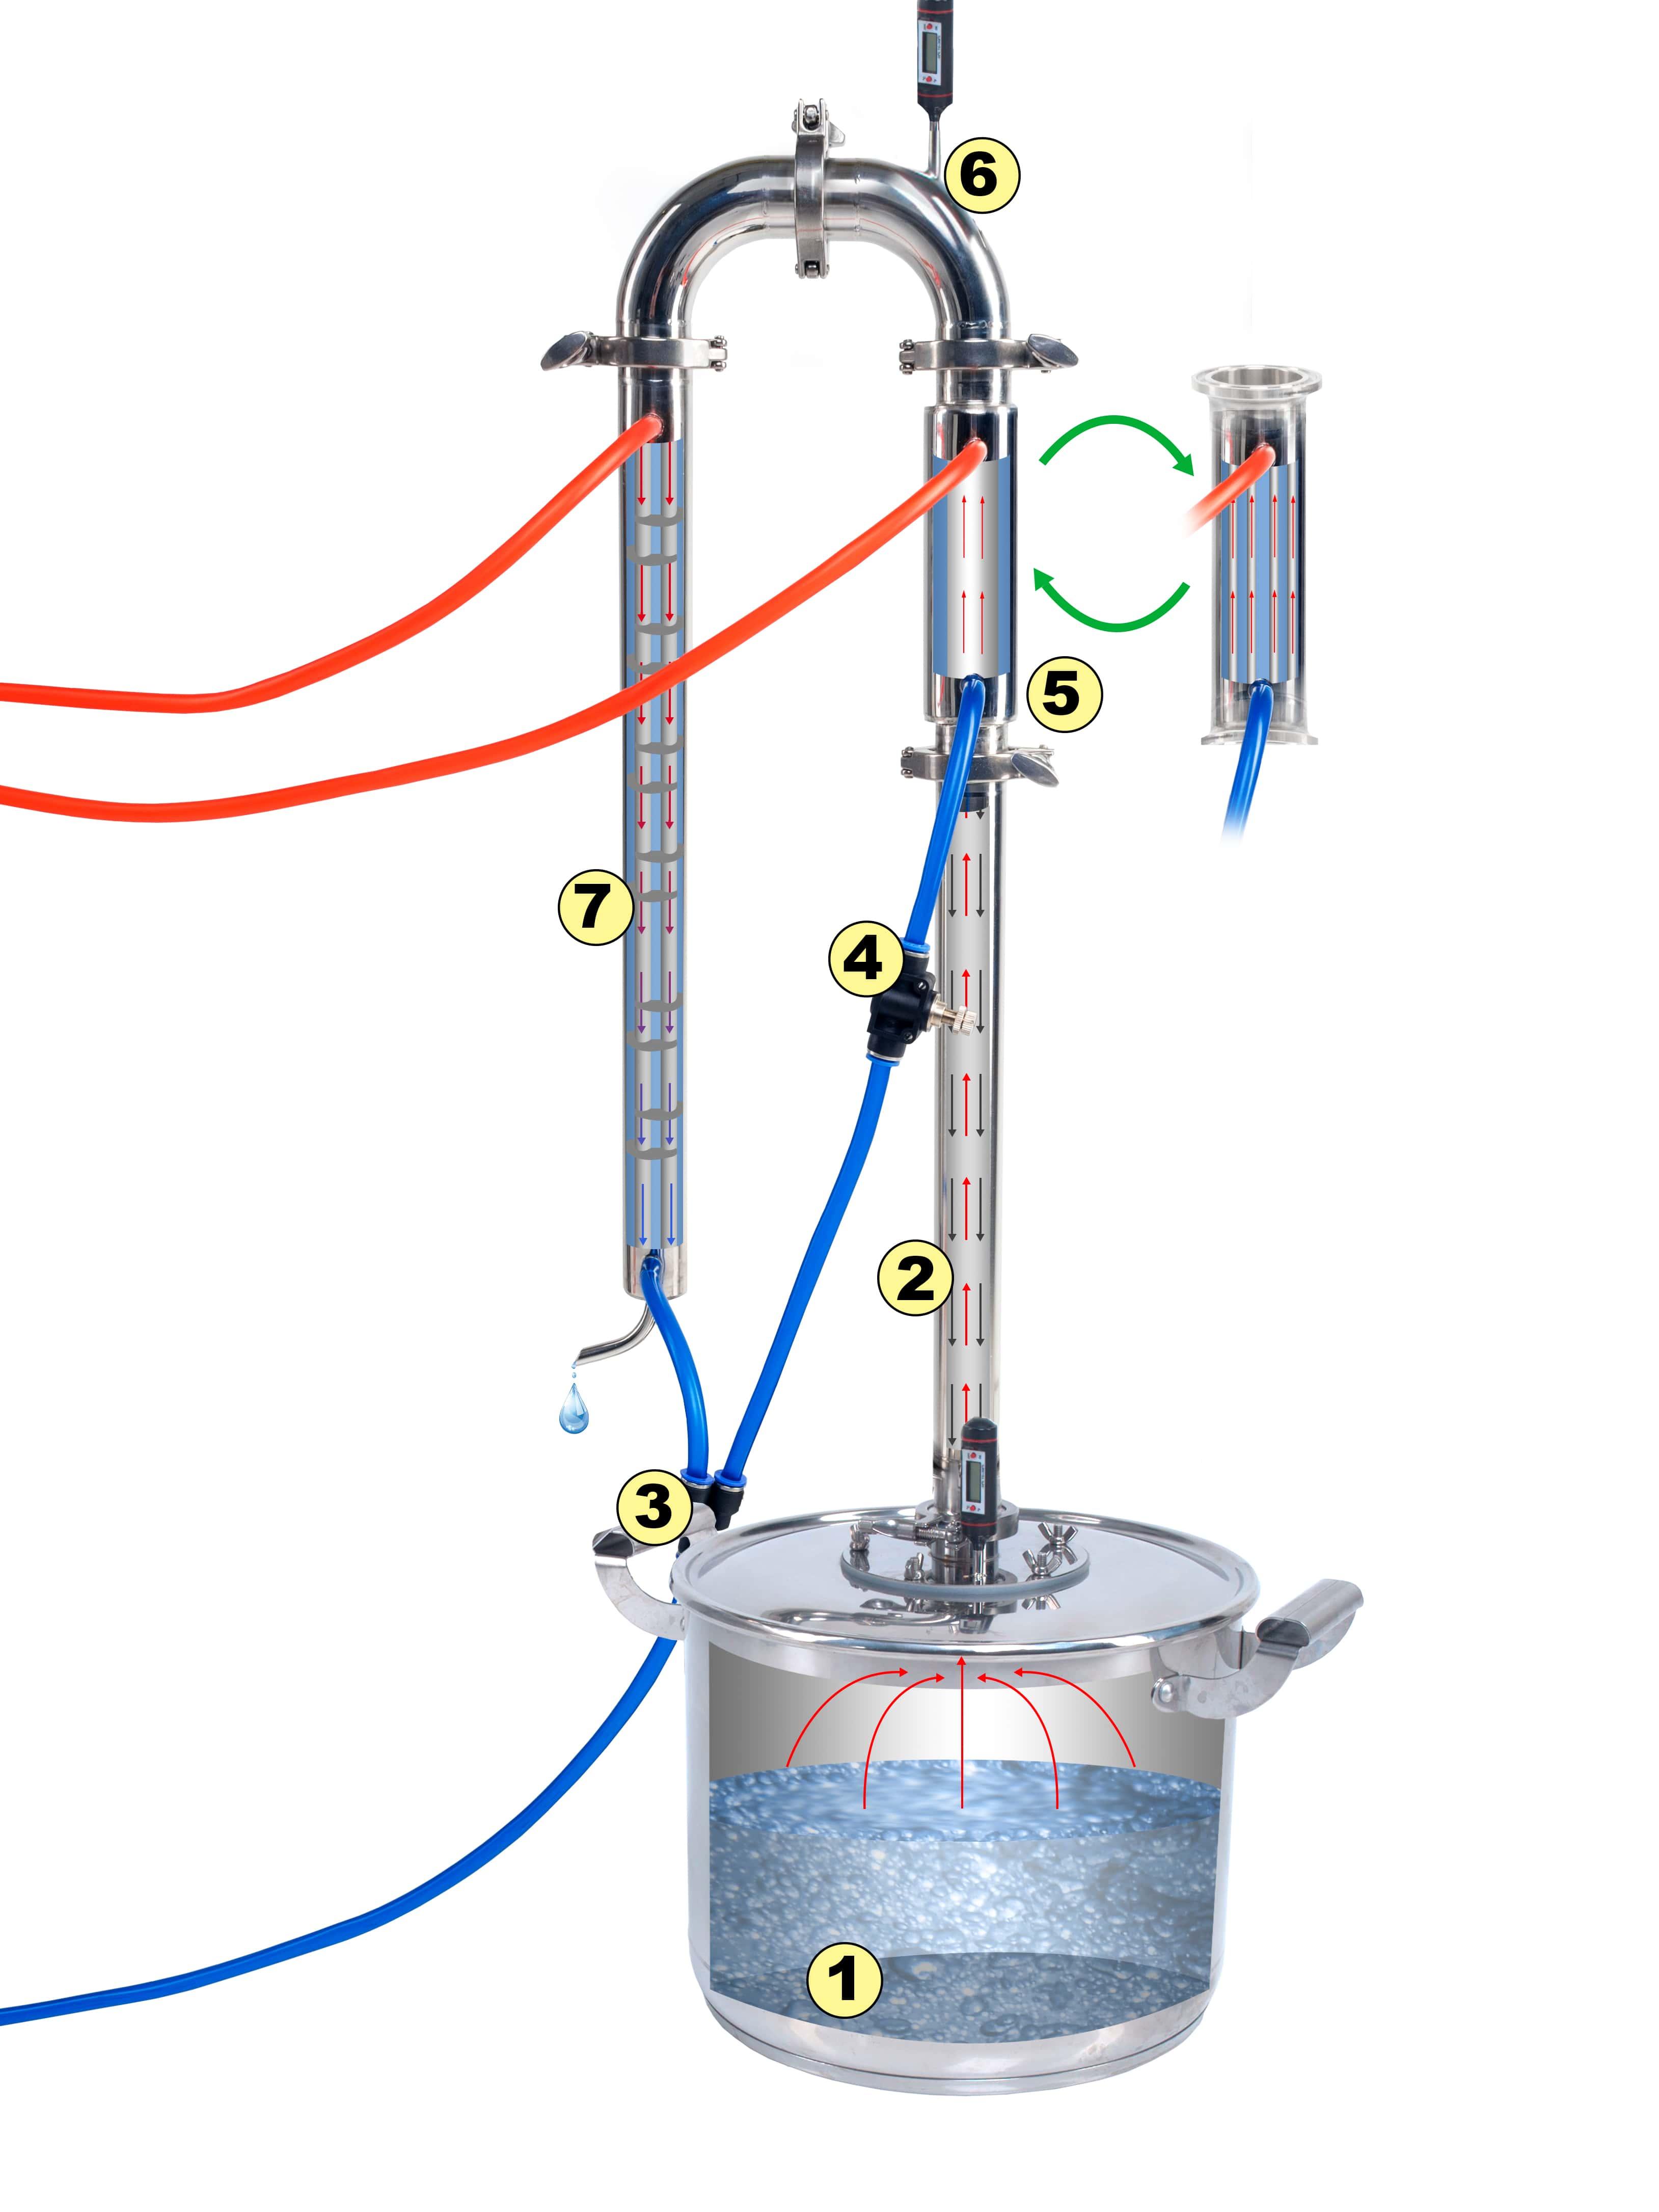 Принцип работы (схема) самогонного аппарата Kanzler